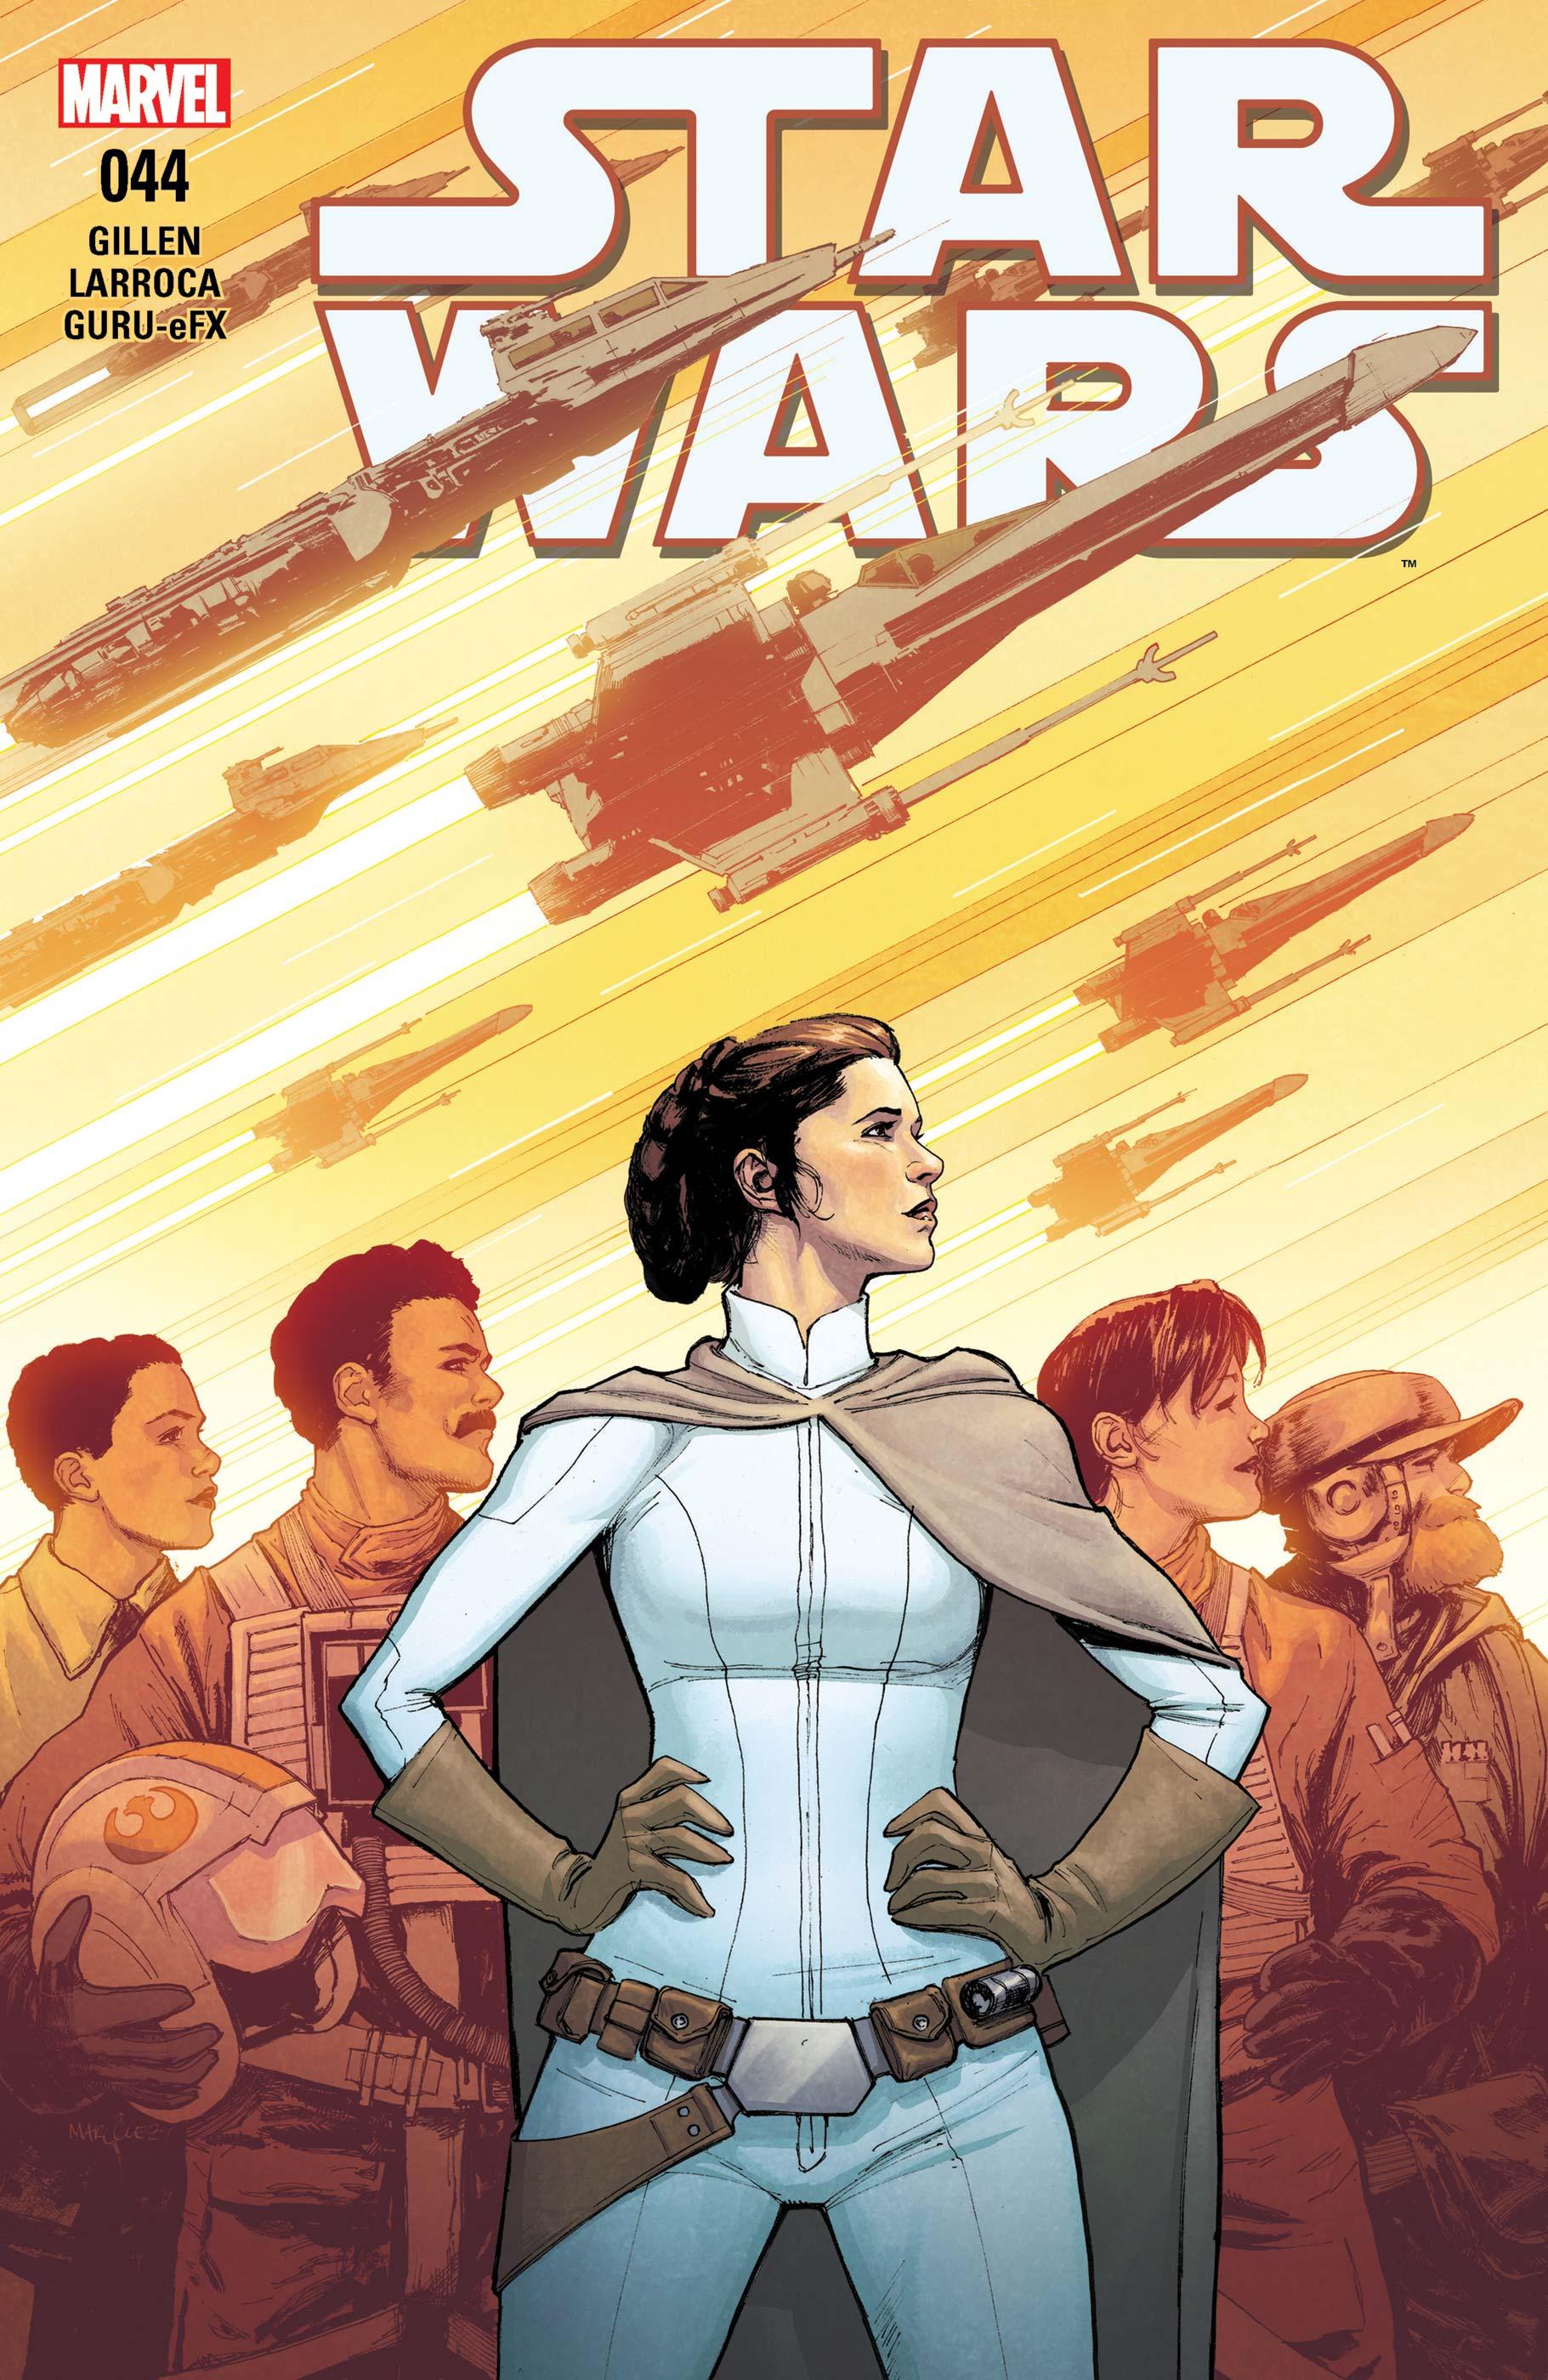 Star Wars (2015) #44